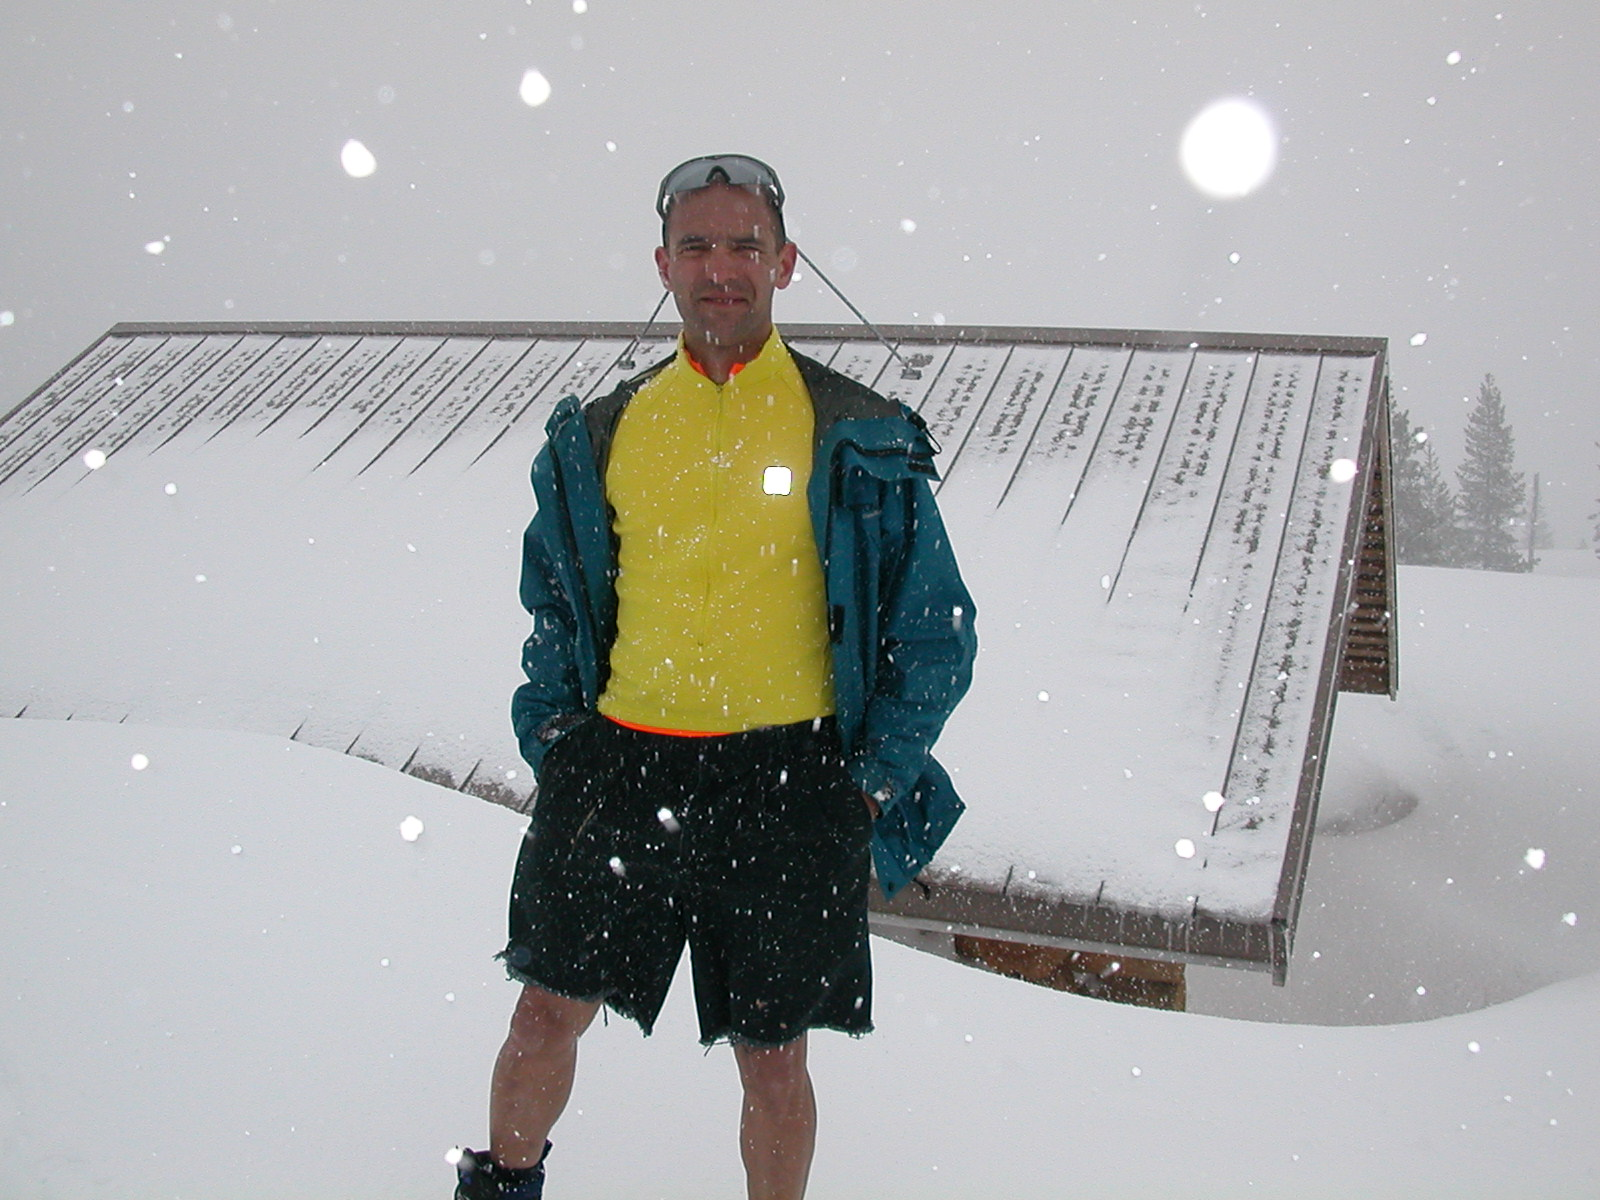 March 19 ski trip